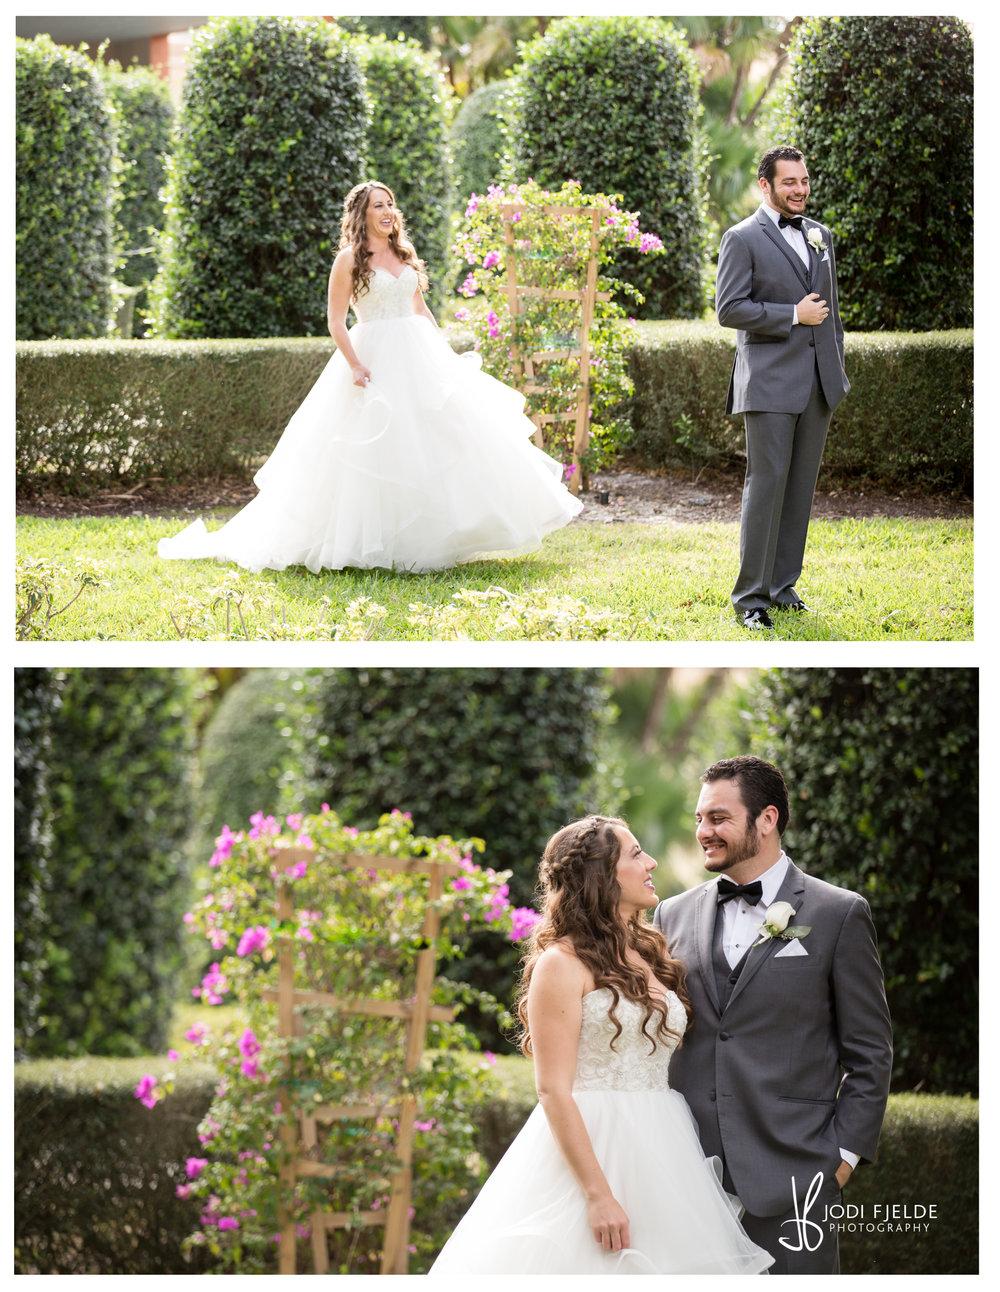 Boynton_Beach_Florida_ Benvenuto_Wedding_Heather__Doug_Married_5.jpg